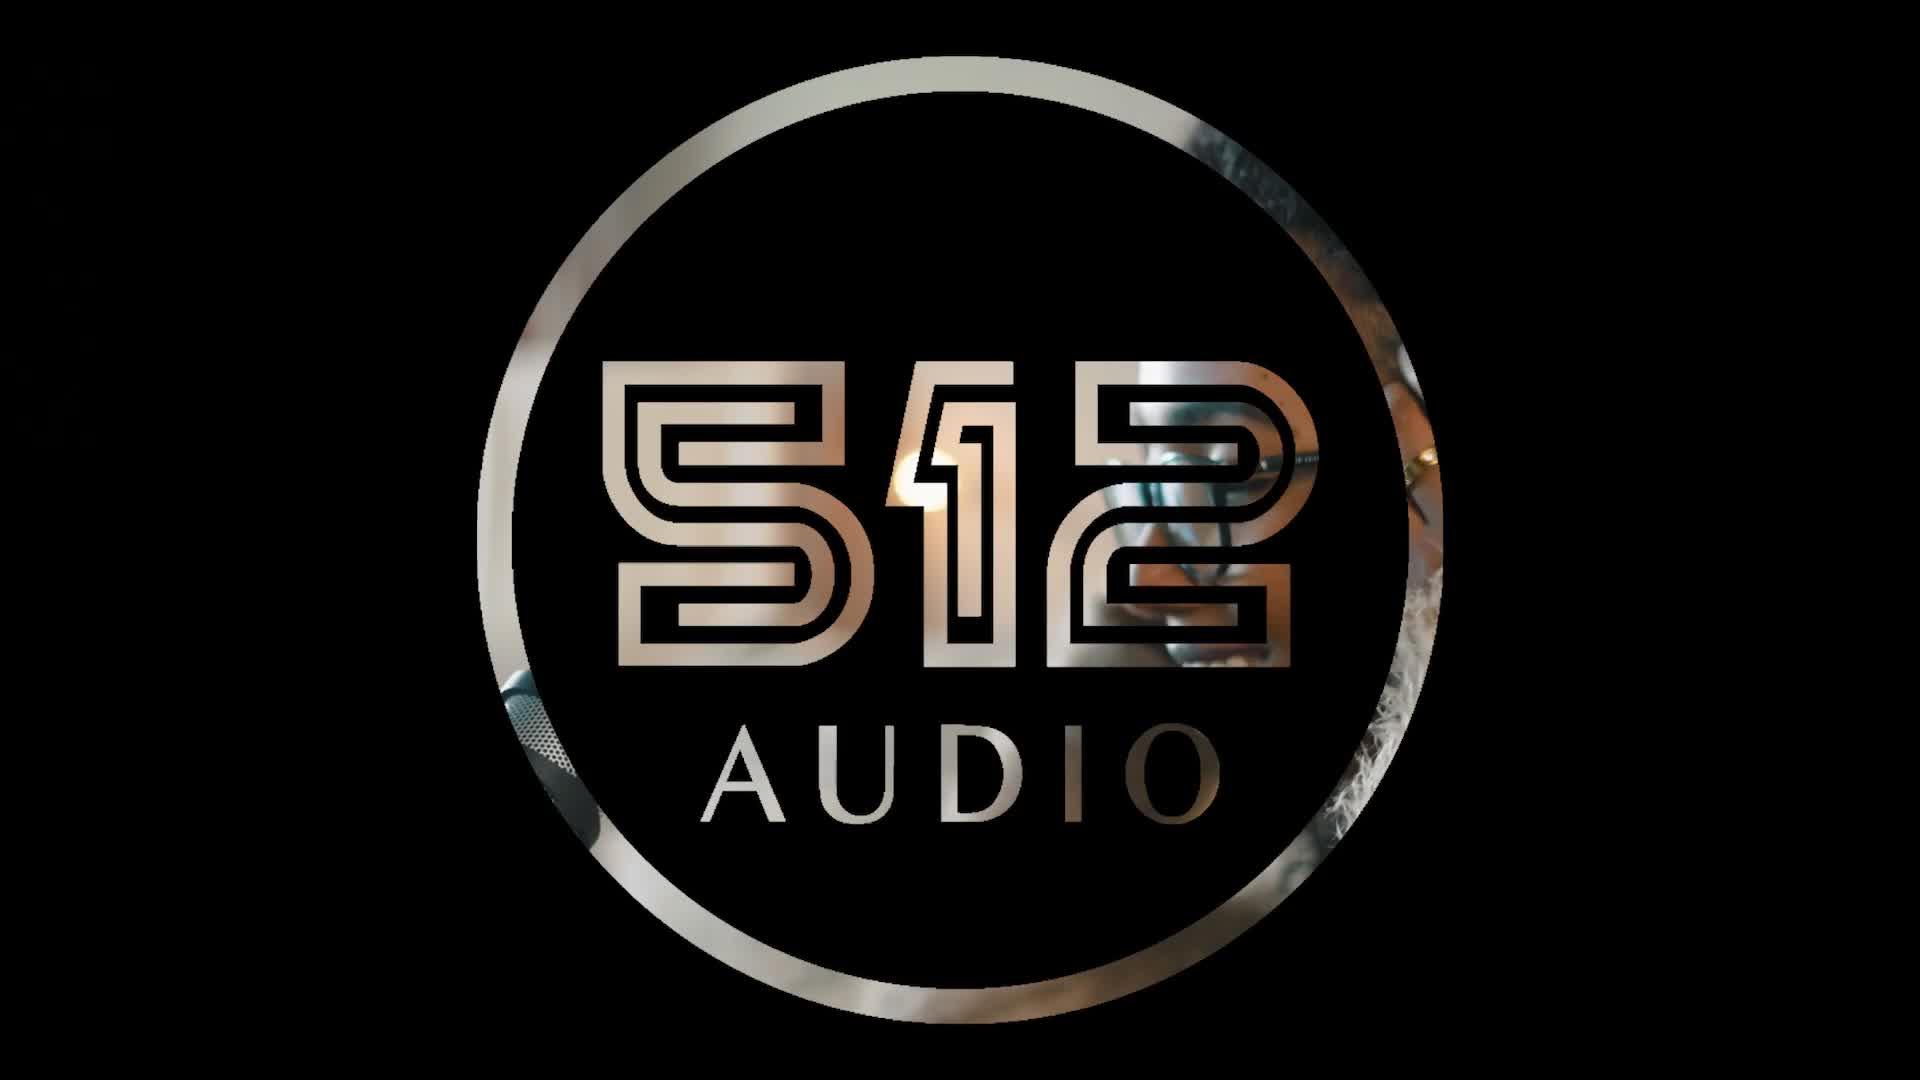 512 Audio品牌介绍